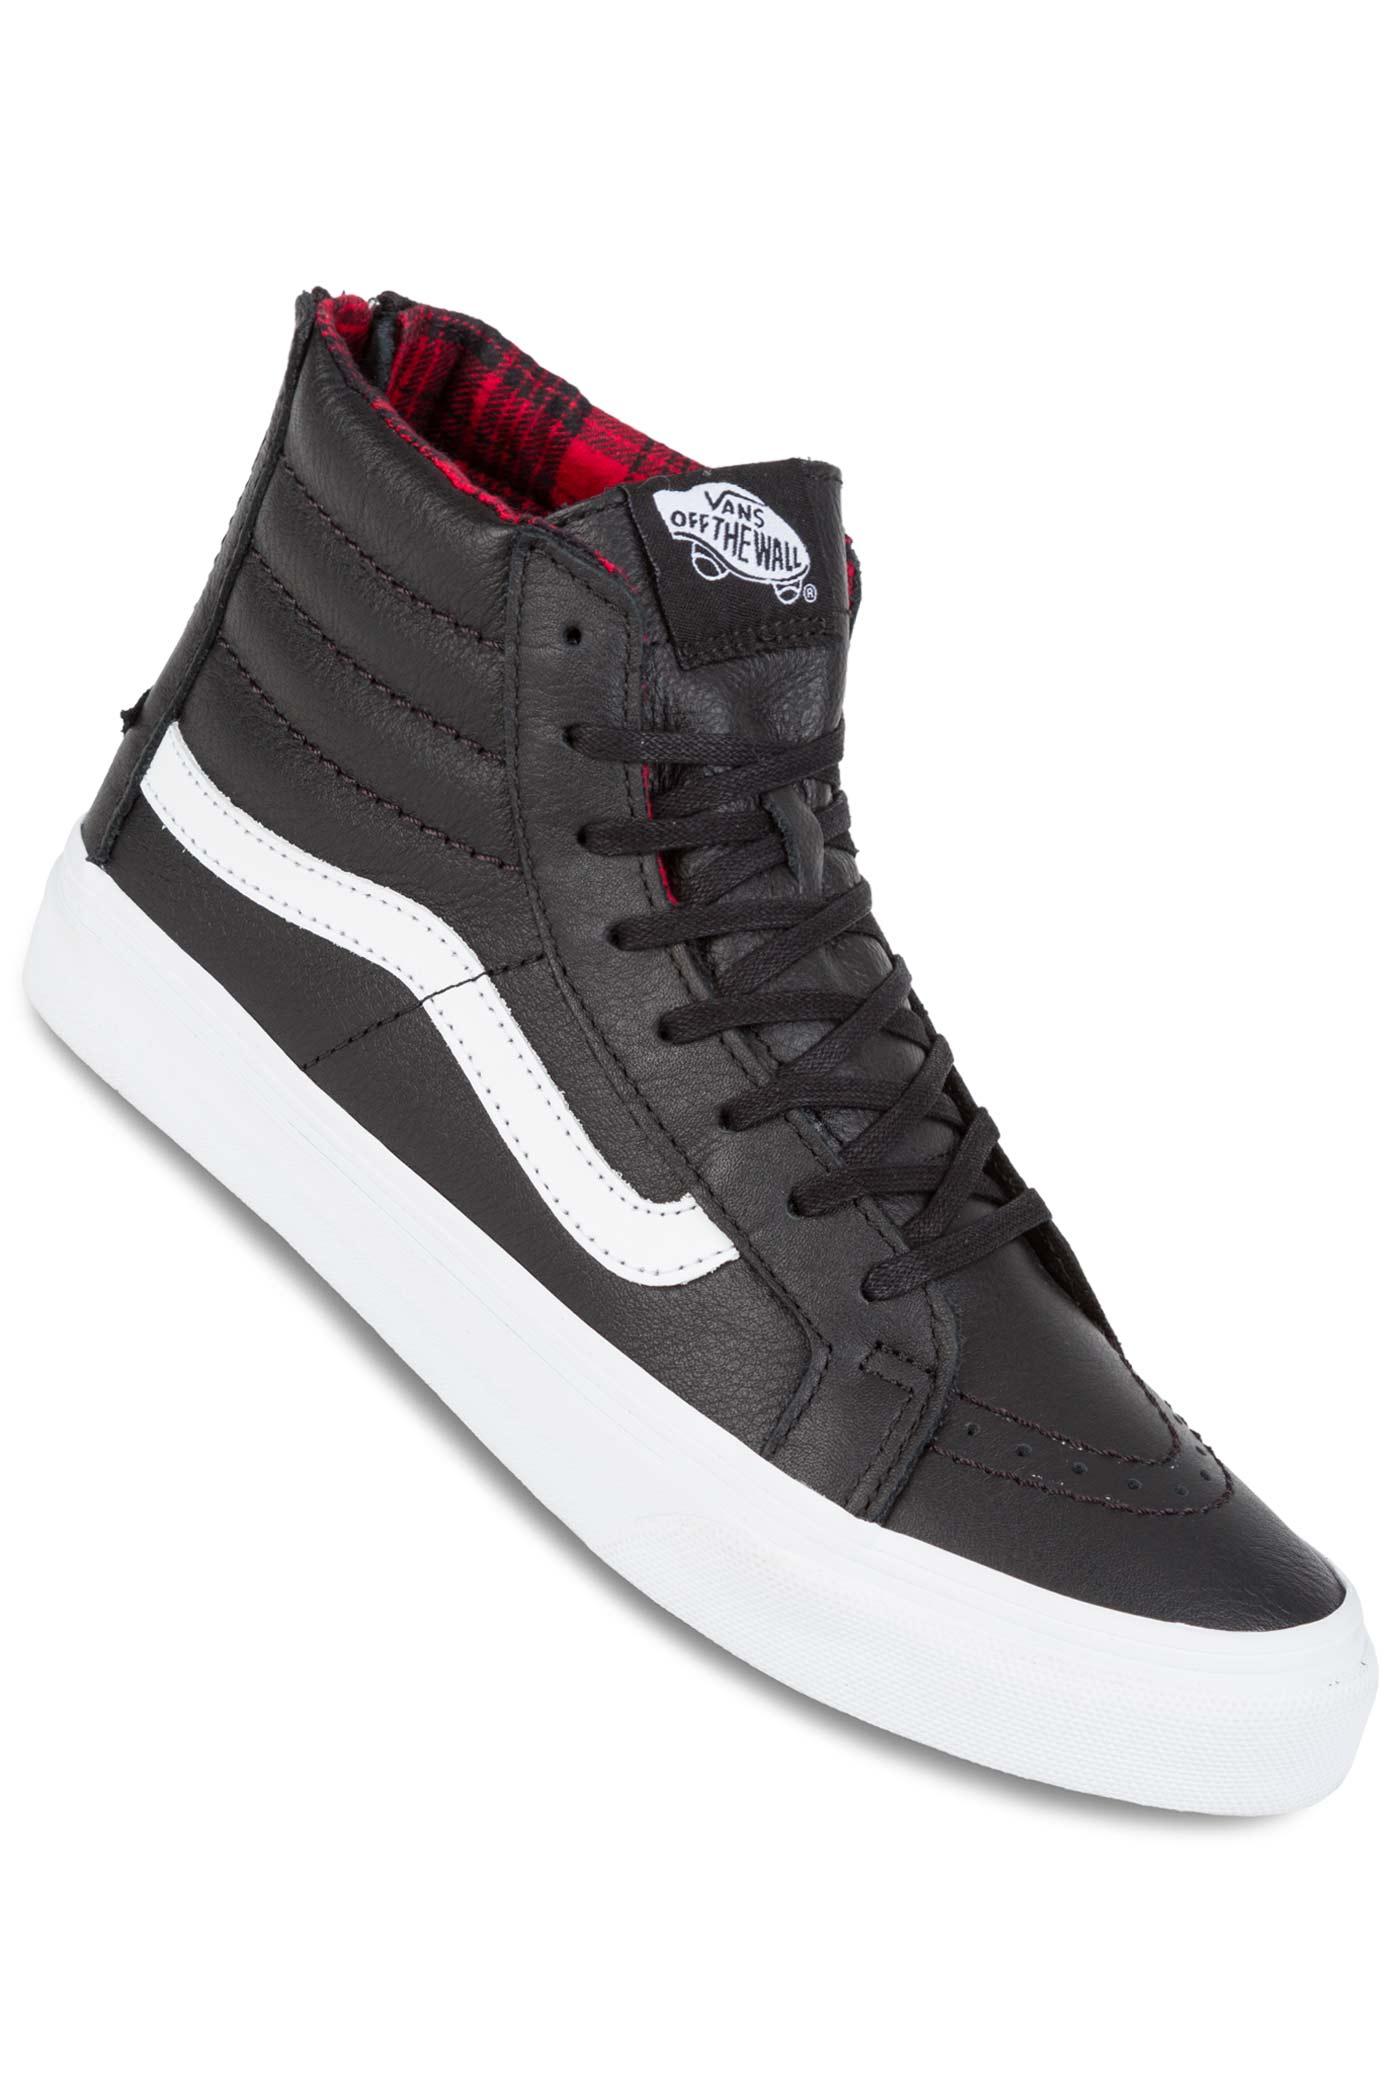 14573dc1de Vans Sk8-Hi Slim Zip Shoe women (plaid flannel black true white) buy ...